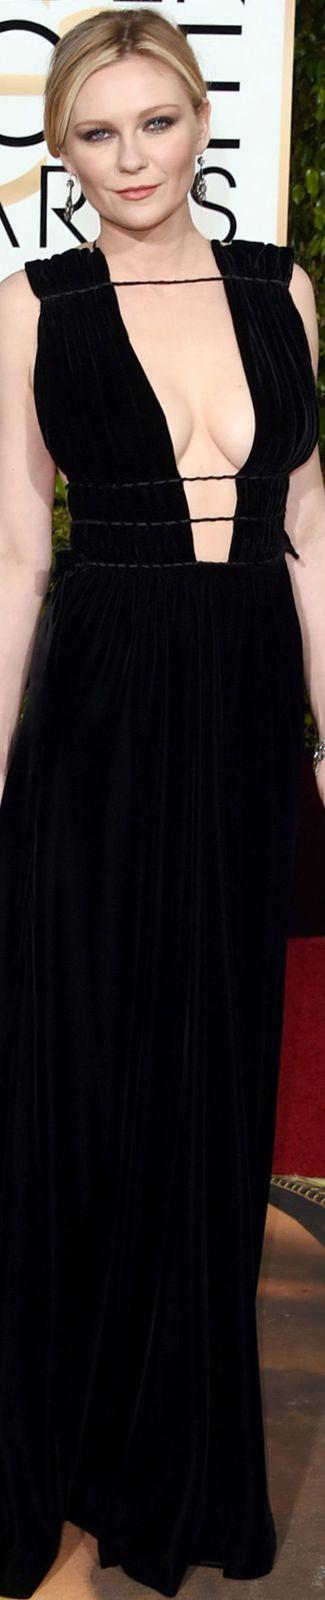 Kirsten Dunst 2016 Golden Globe Awards wearing Valentino.♛   ♛~✿Ophelia Ryan ✿~♛